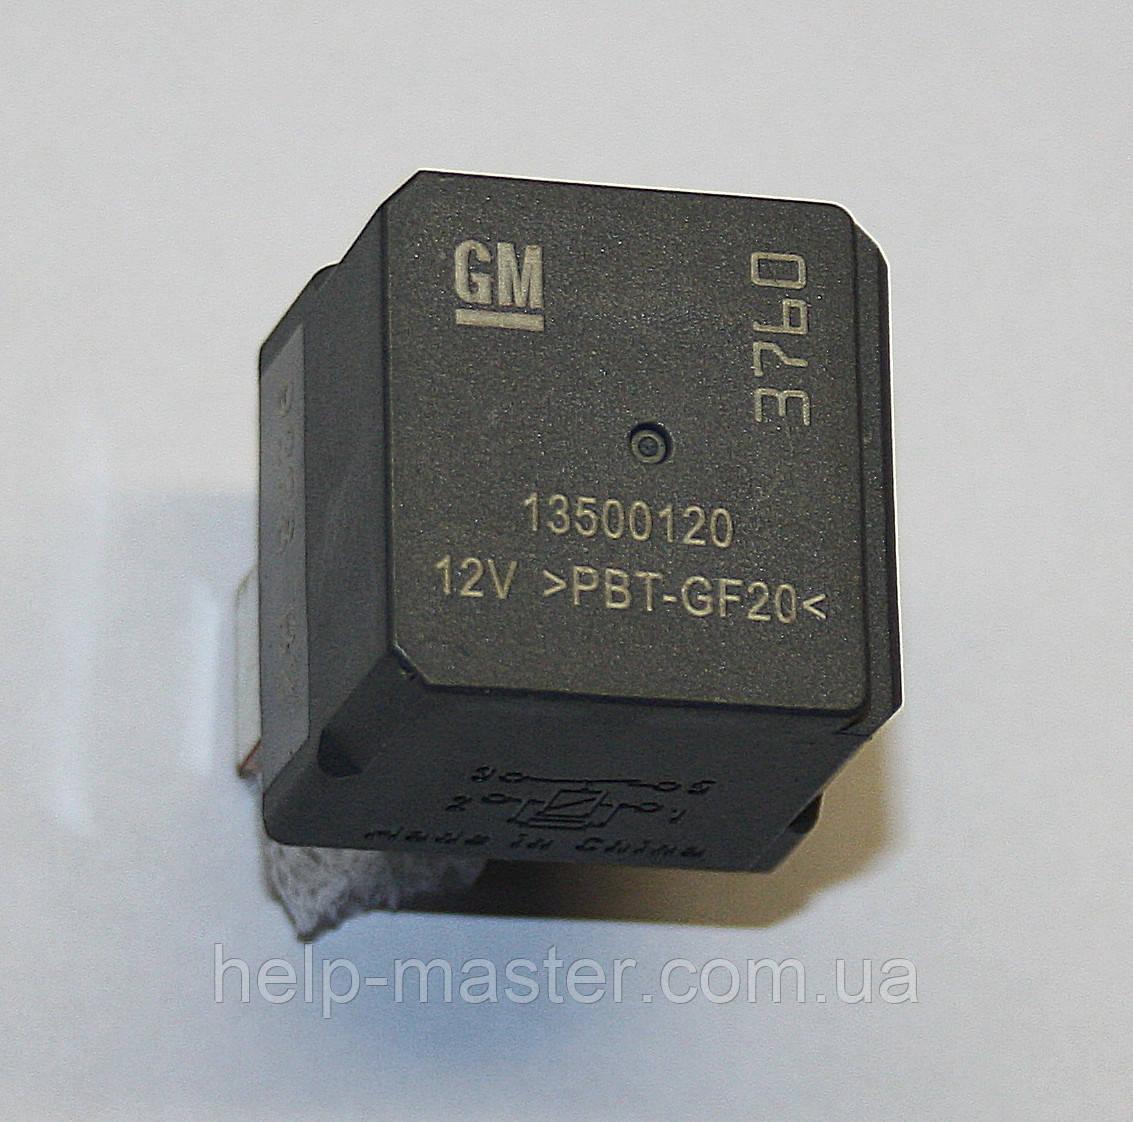 Авто реле 13500120 12V-PBT-GF20 (12VDC)